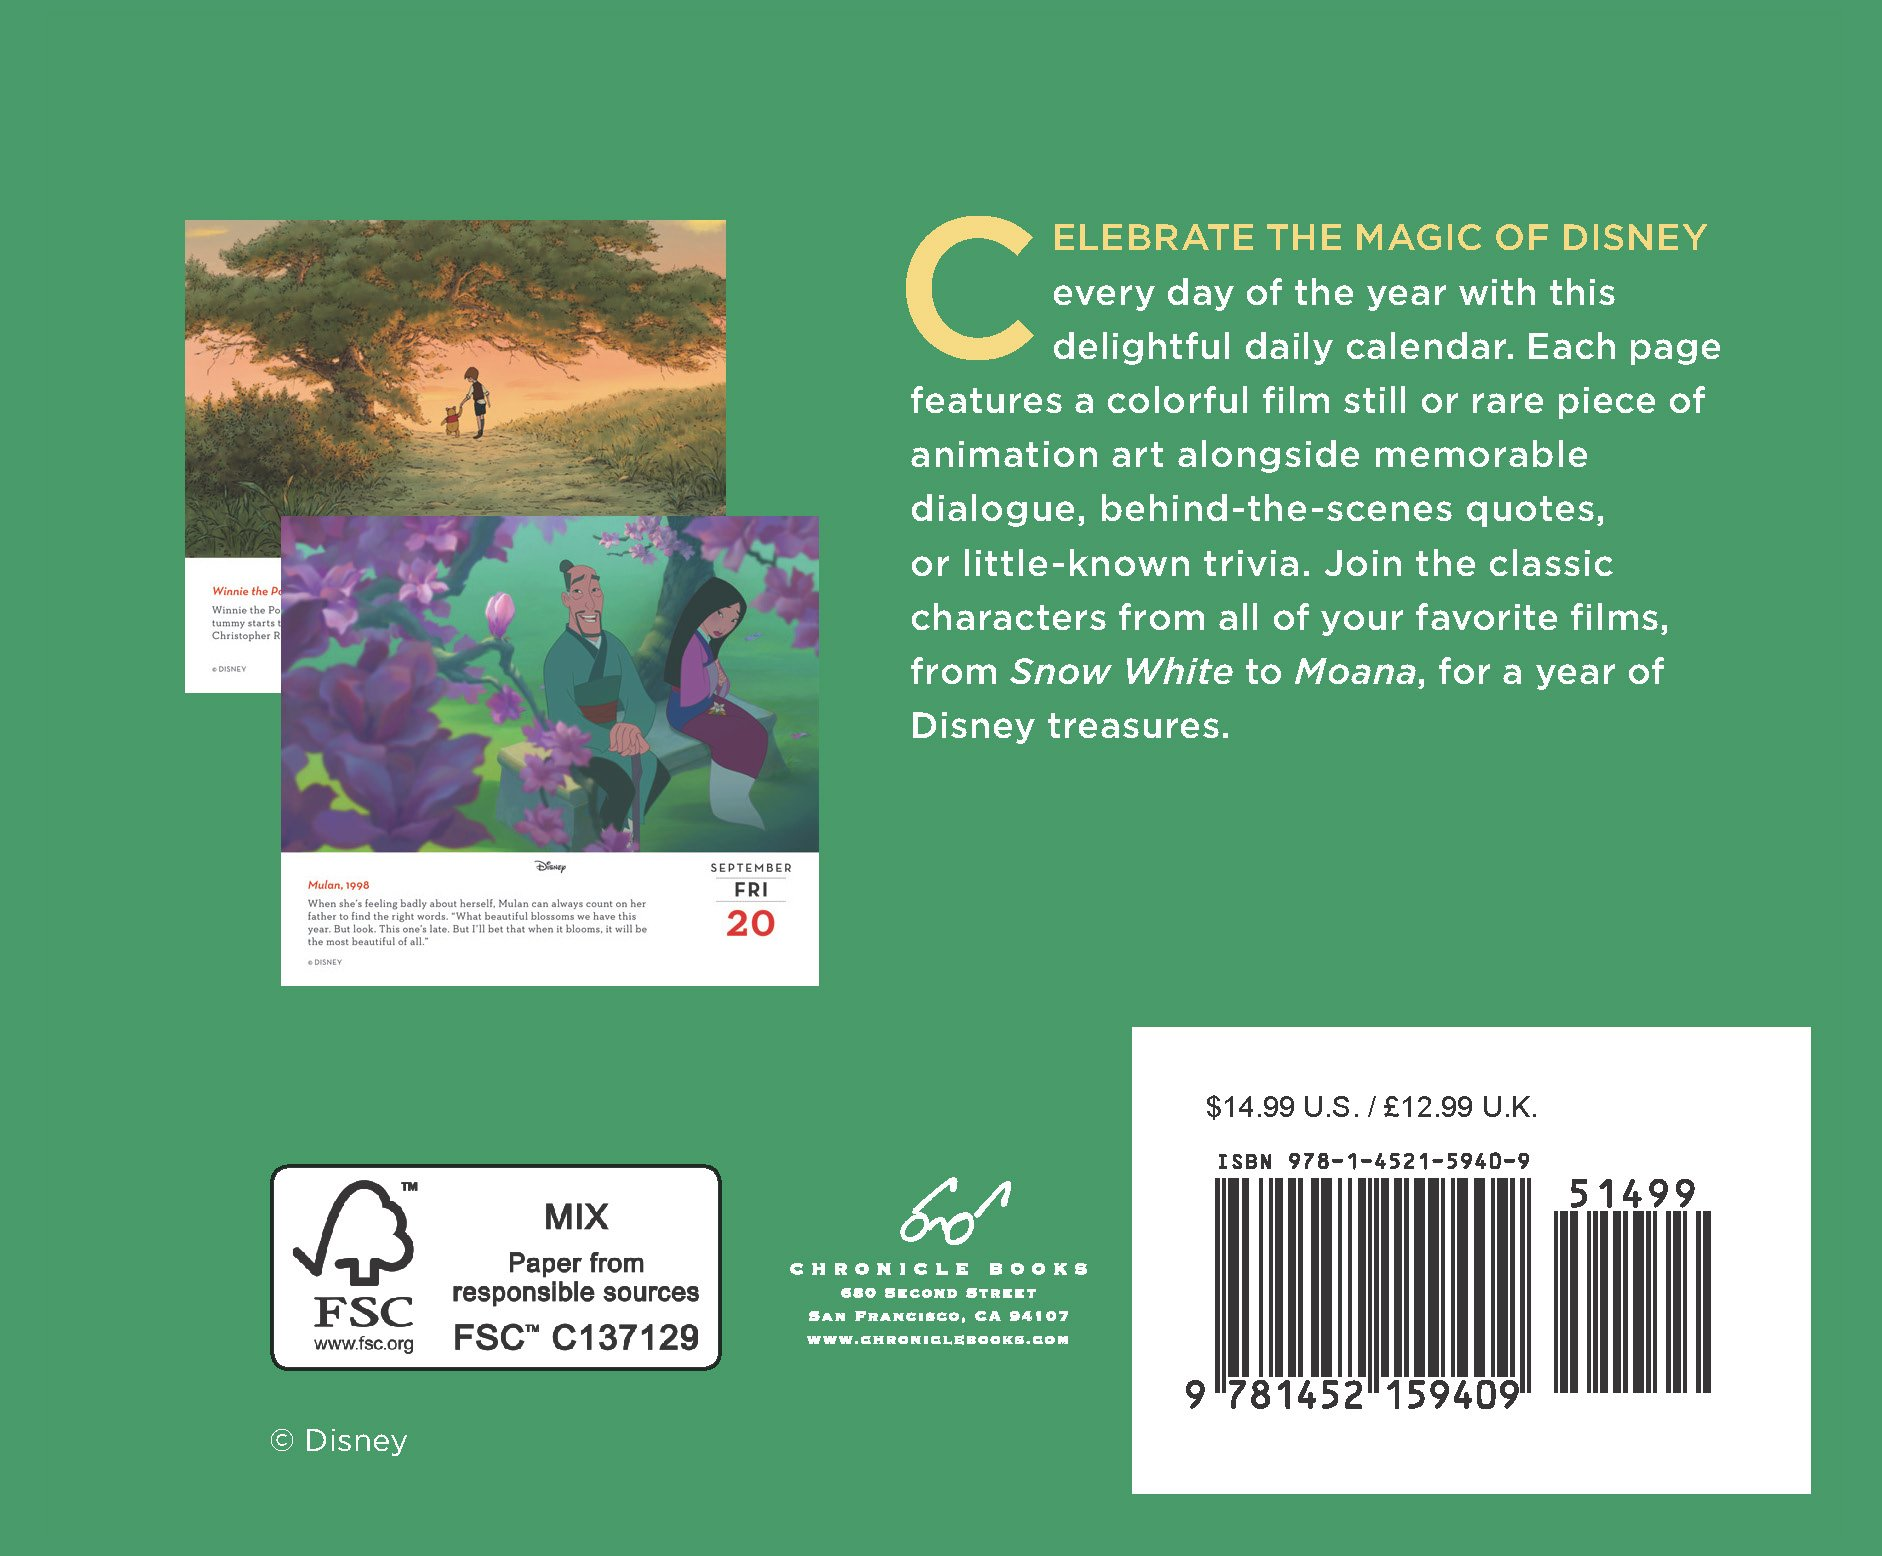 Disney 2019 Daily Calendar by Chronicle Books